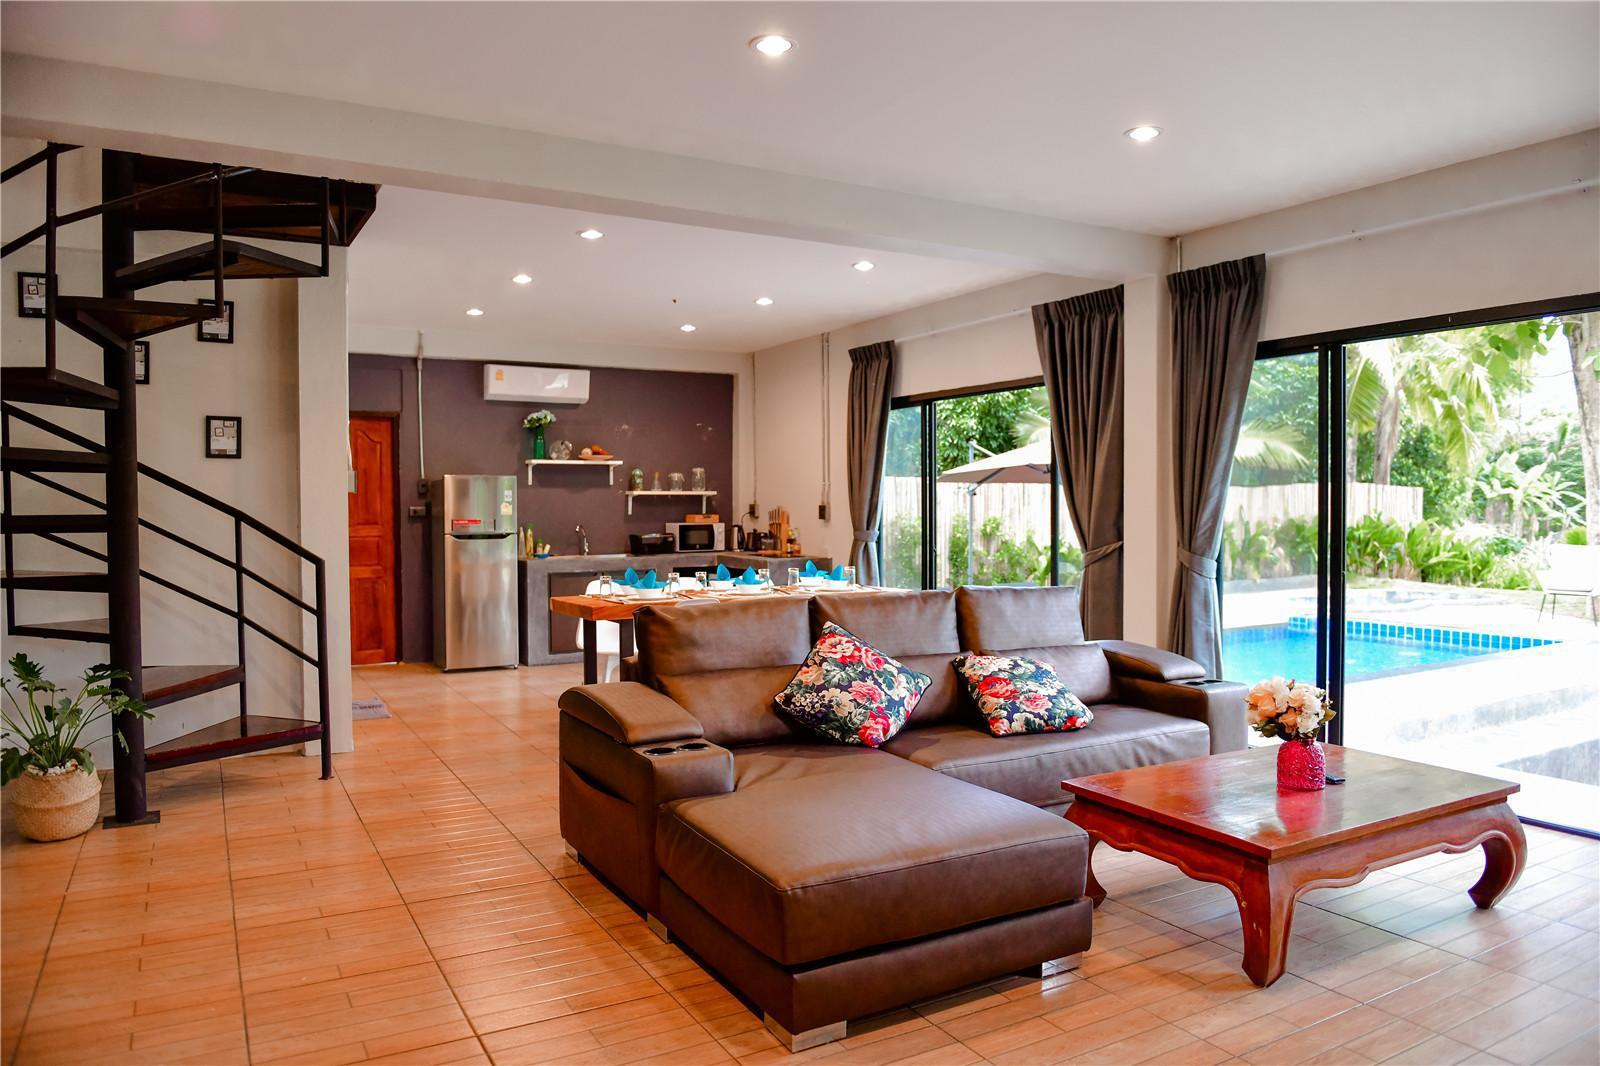 Hot spring Gardenscape pool villa / 4BR วิลลา 4 ห้องนอน 4 ห้องน้ำส่วนตัว ขนาด 466 ตร.ม. – ดอยสะเก็ด